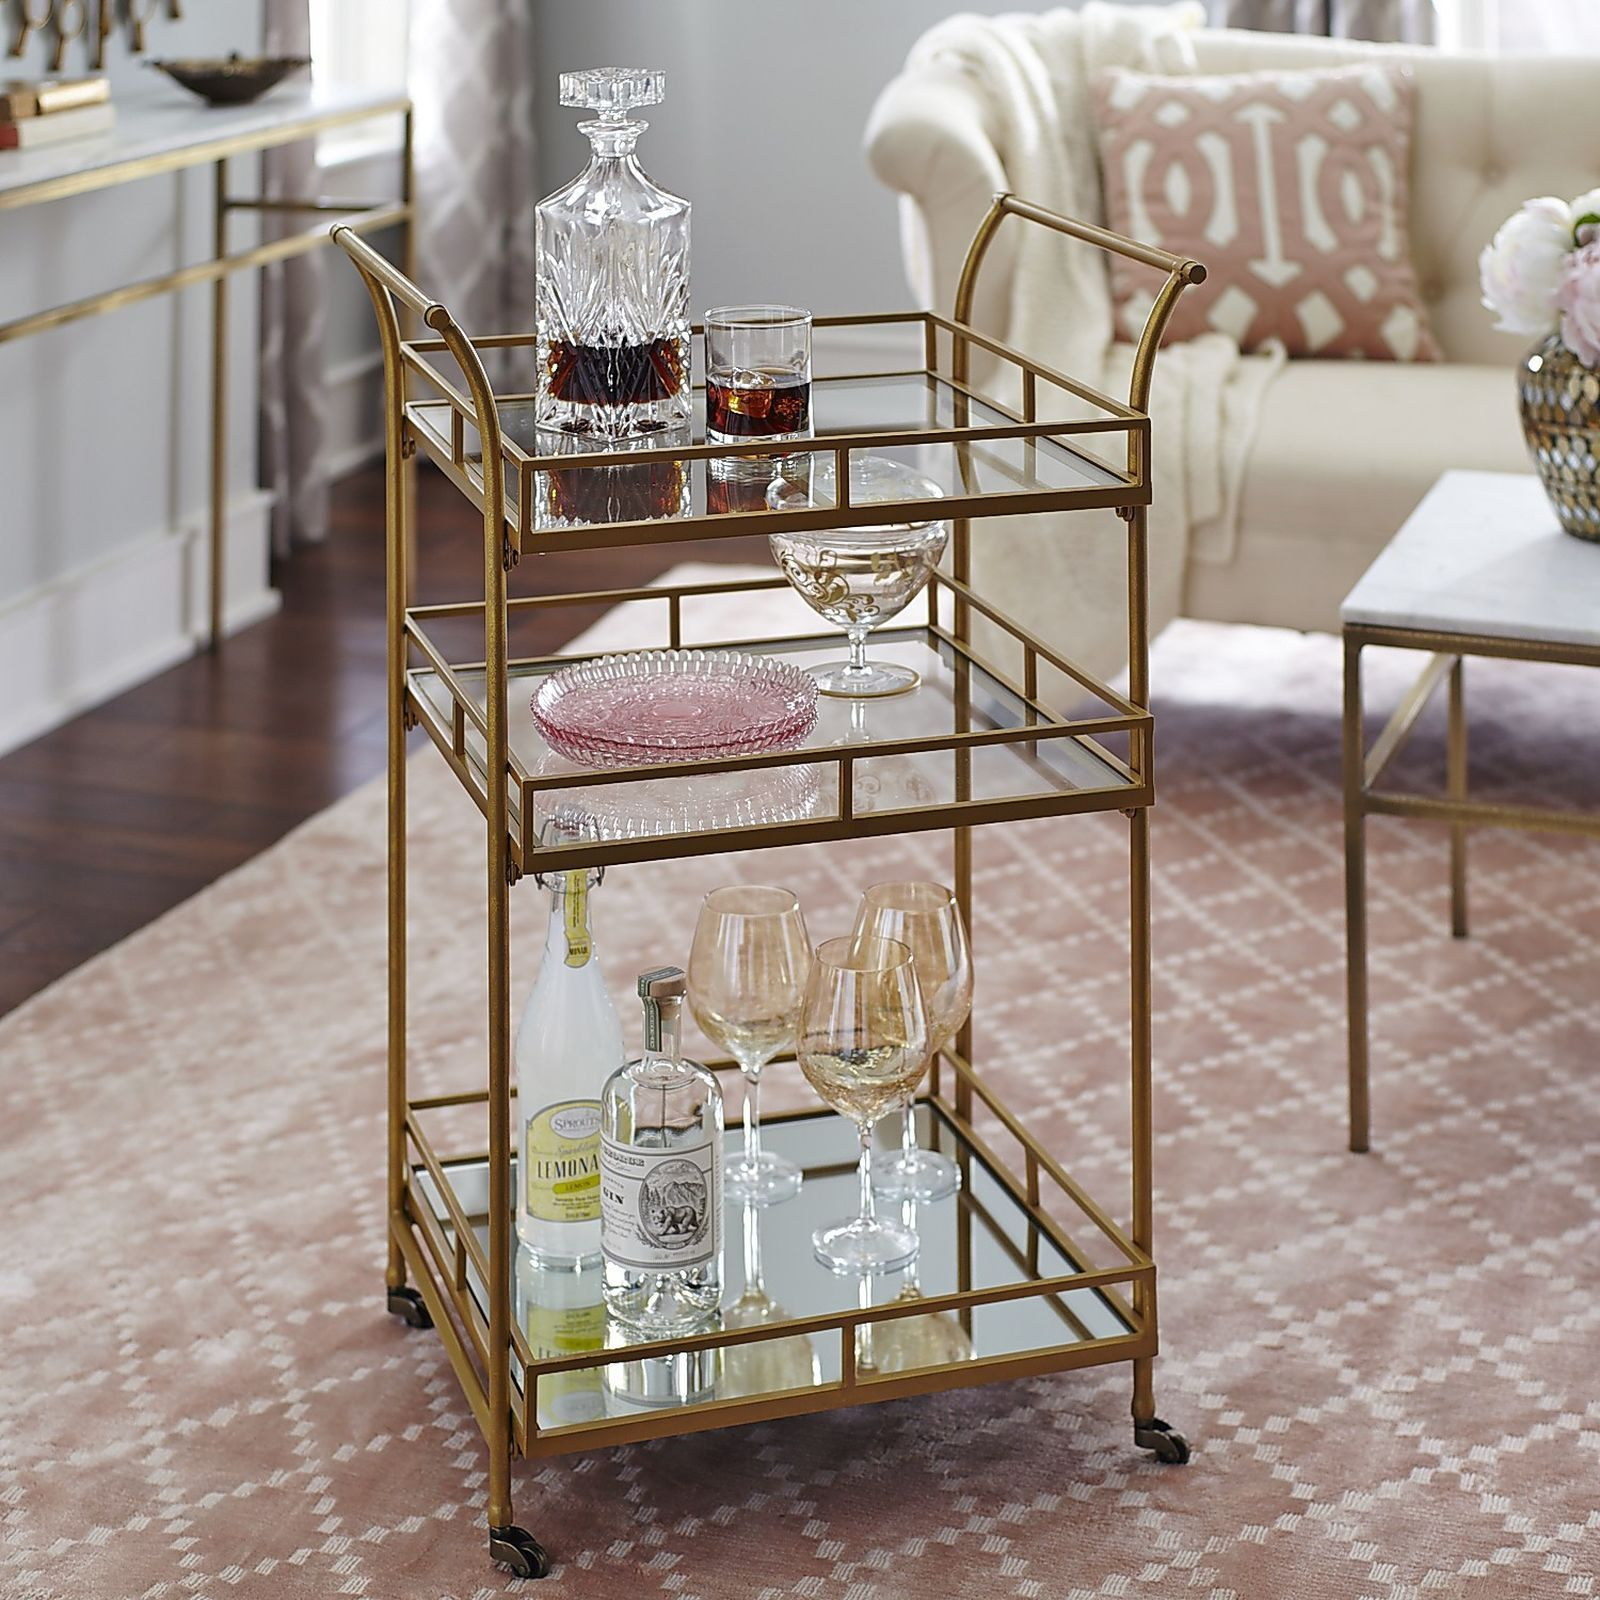 golden square bar cart in 2019 home decor bar cart gold bar cart bar cart decor. Black Bedroom Furniture Sets. Home Design Ideas